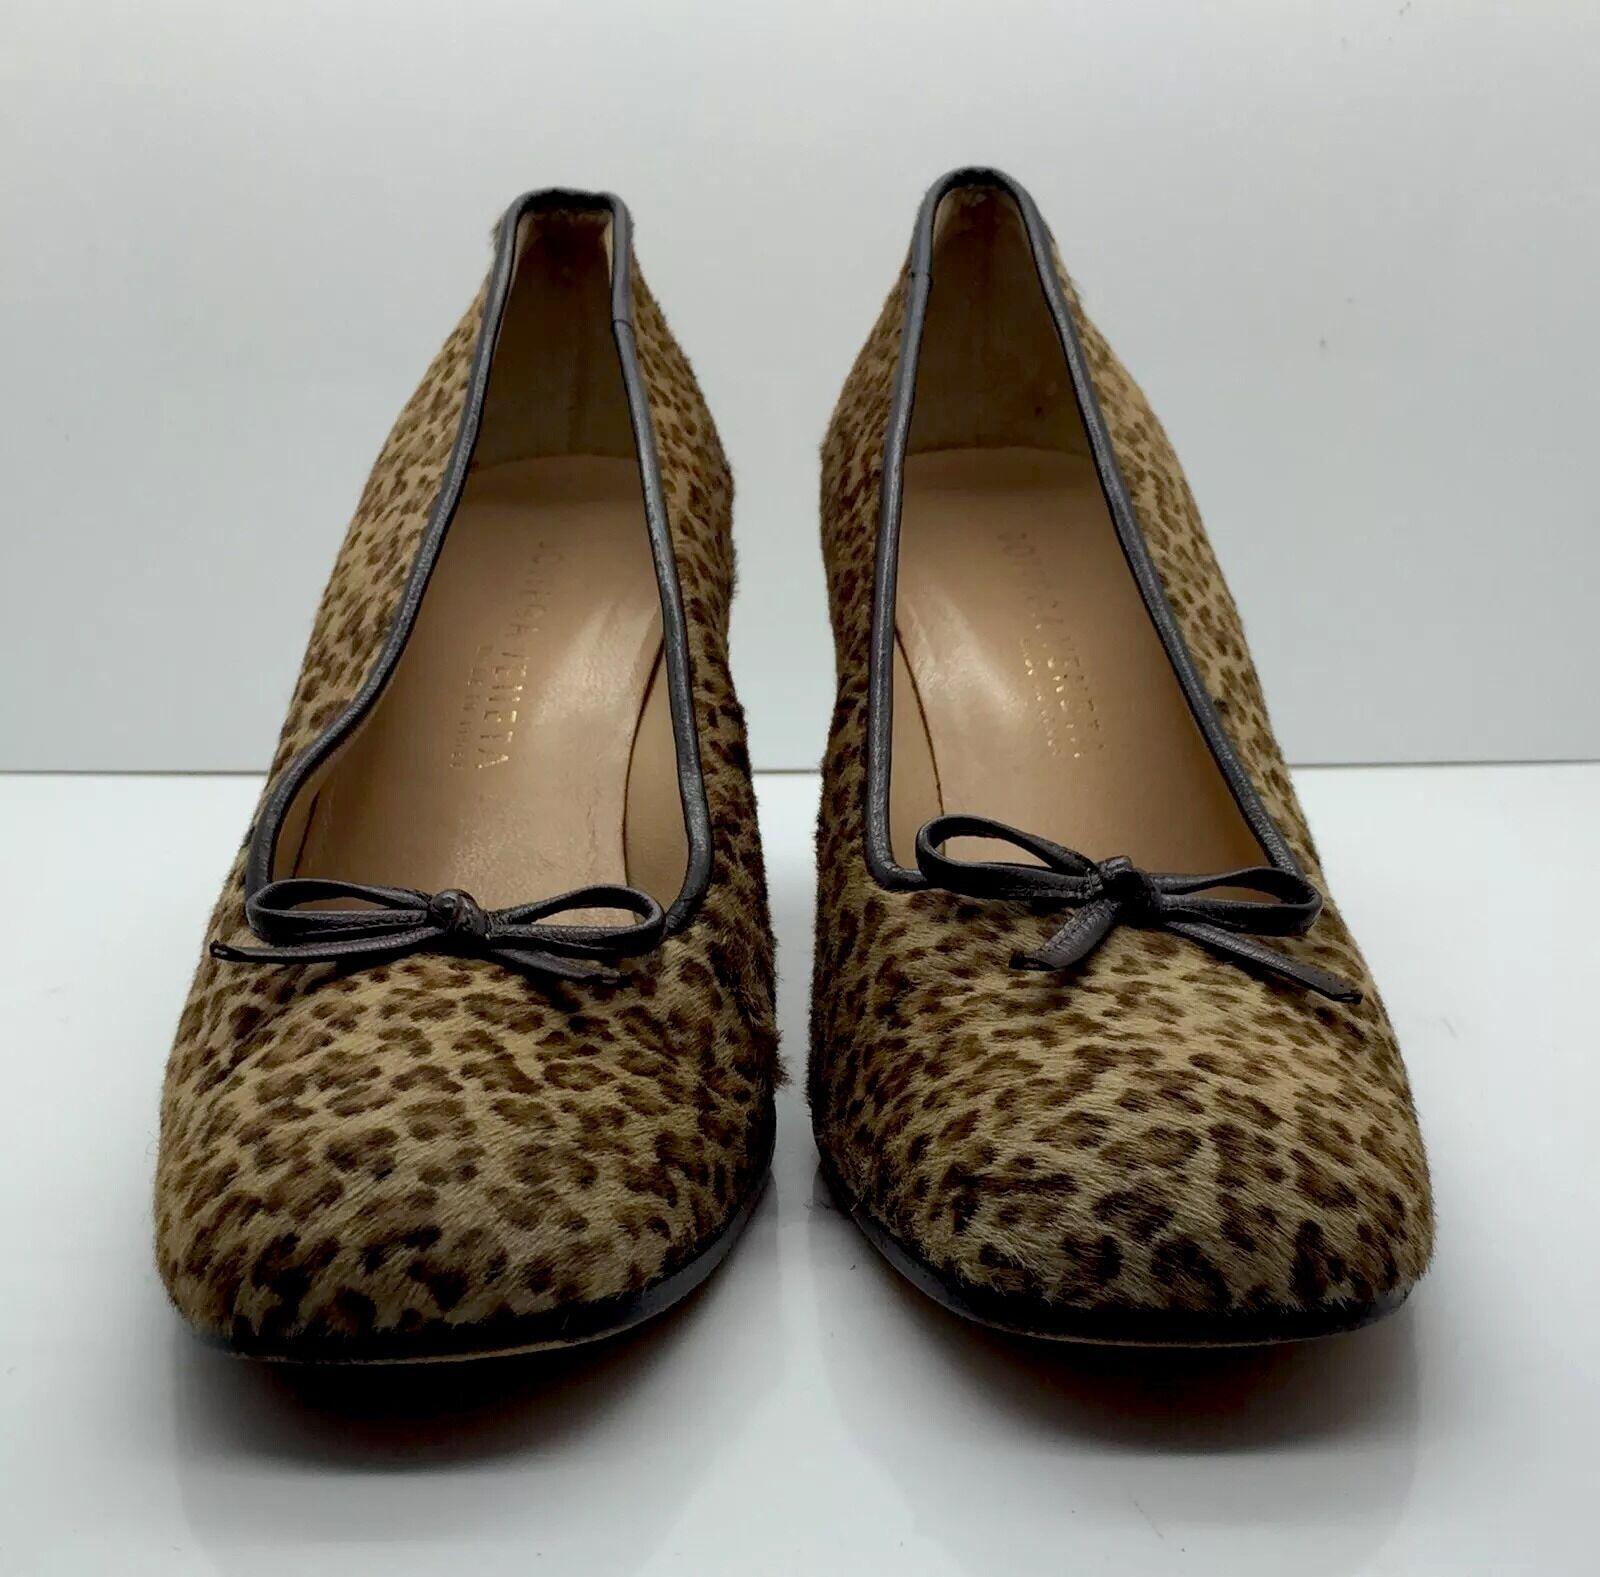 BOTTEGA VENETA Cheetah Leopard Pony Hair Leather Pumps Heels Bow Sz 8.5 B Italy